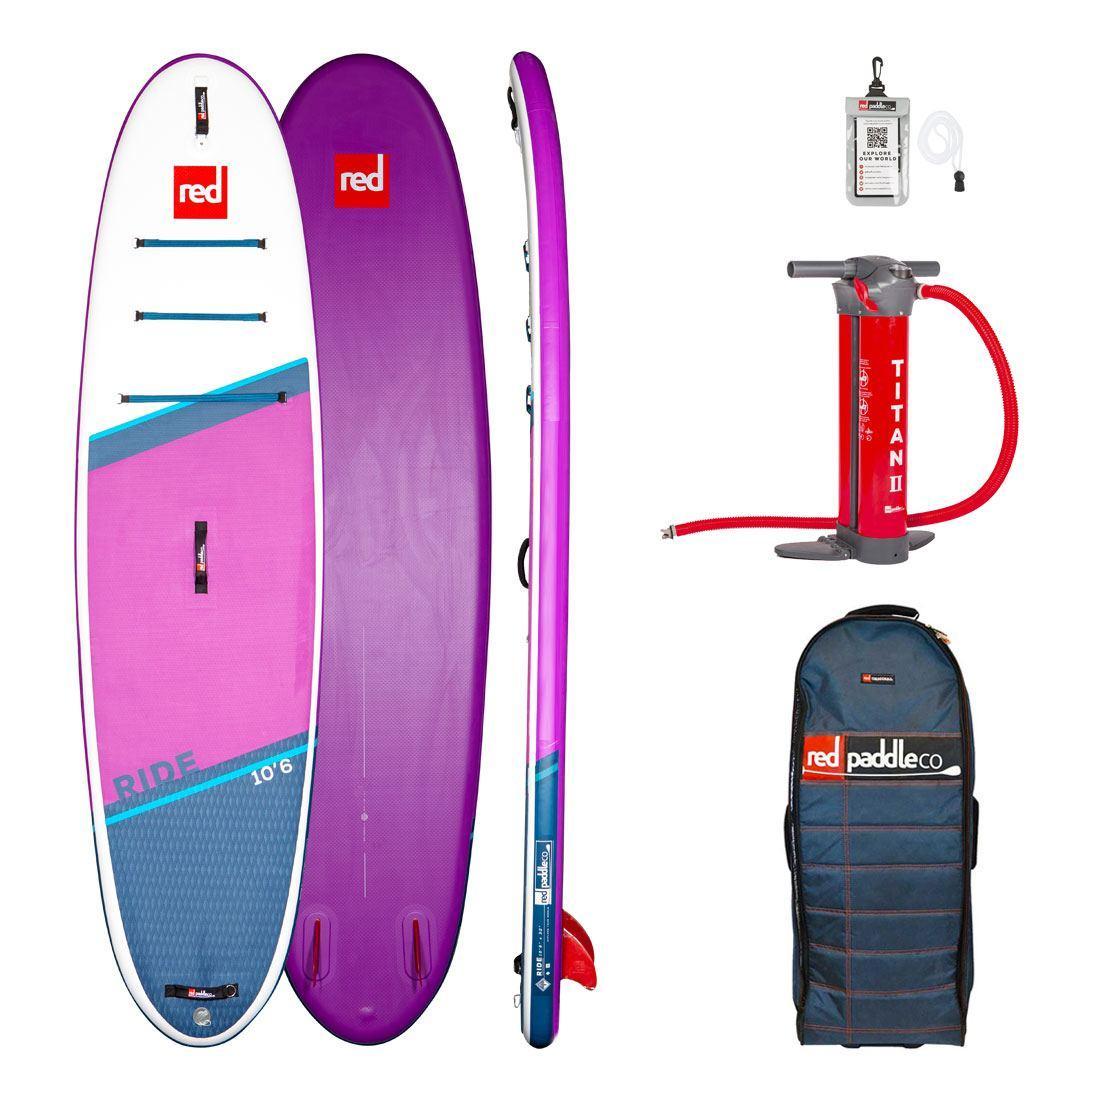 "Сапборд Red Paddle Co Ride SE 10'6"" x 32"" 2021 - надувна дошка для САП серфінгу, sup board"